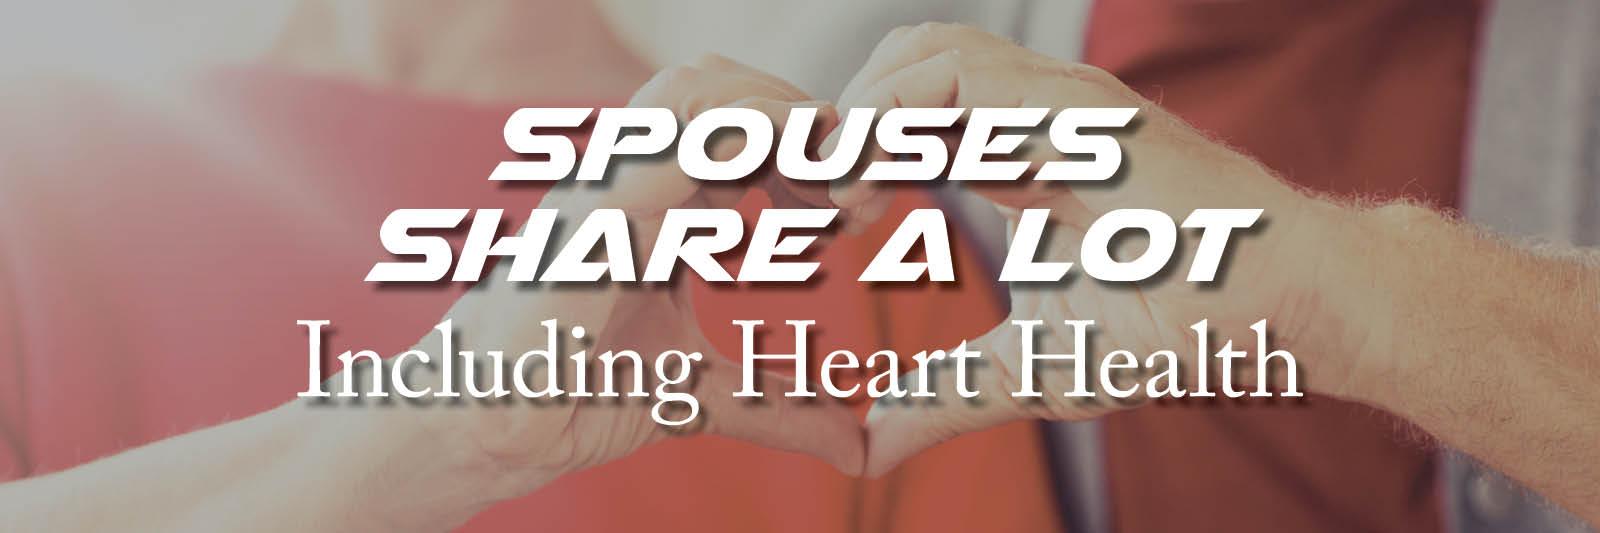 Spouses Share Alot